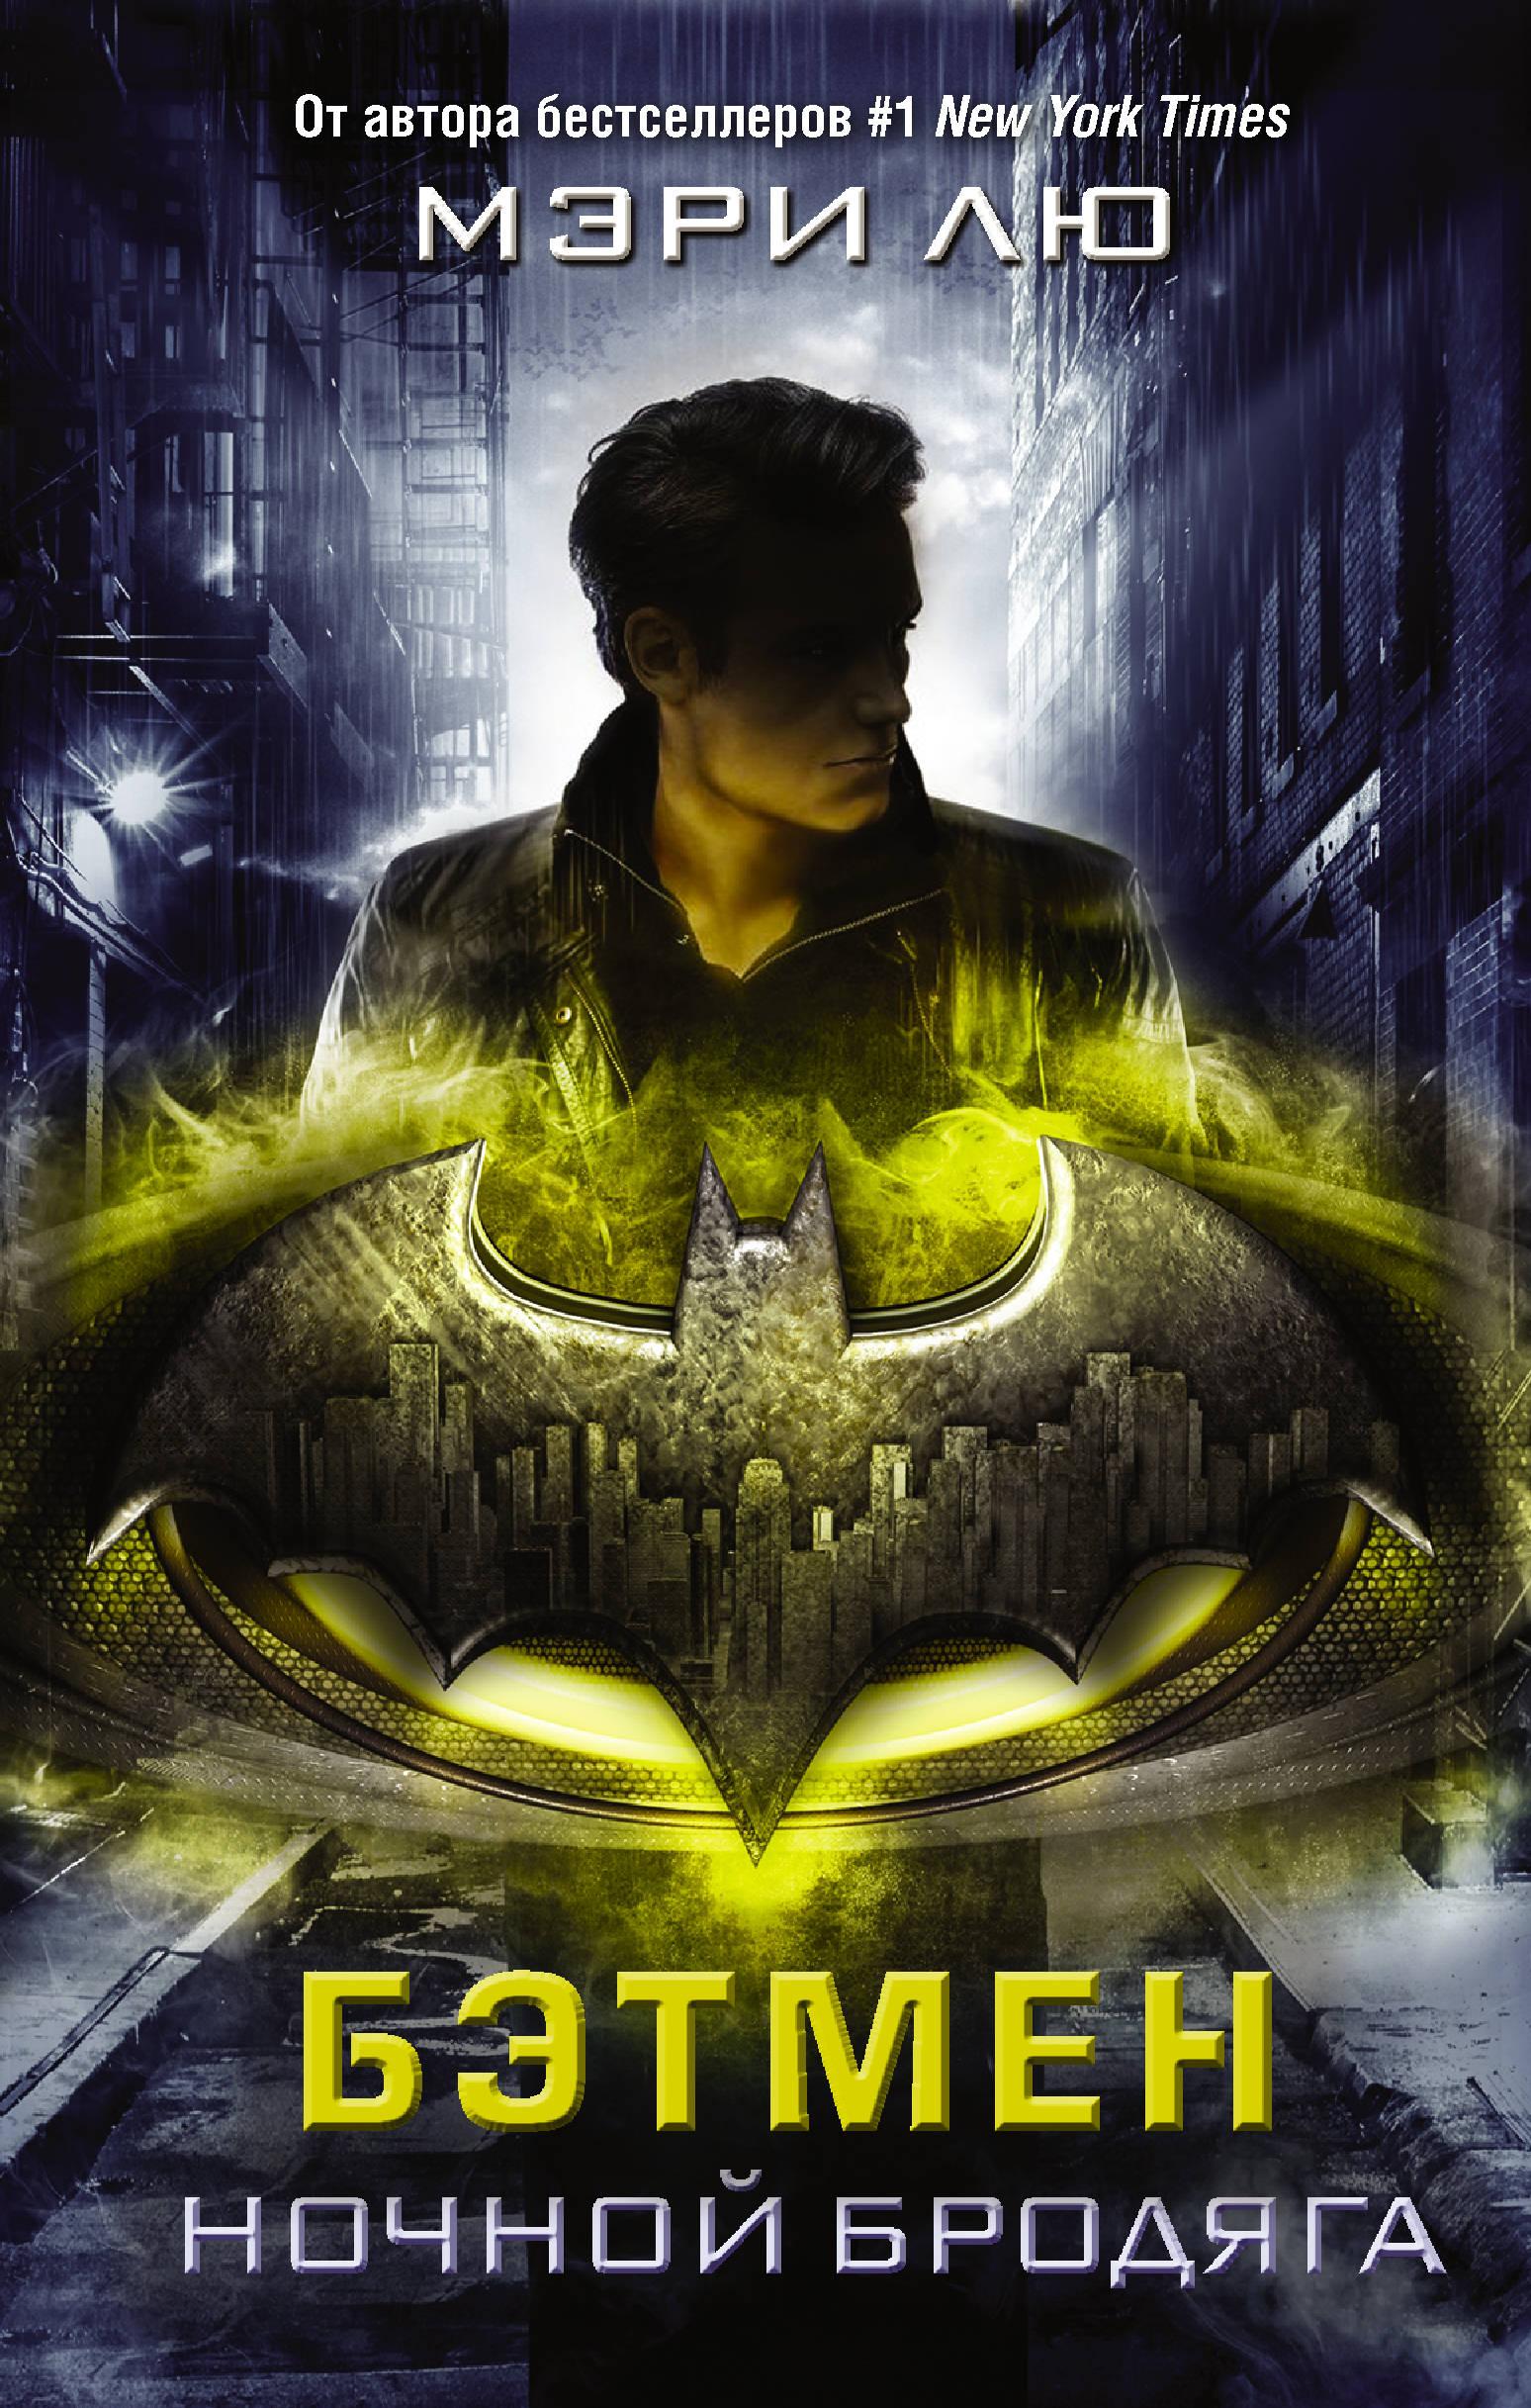 Лю М. Бэтмен. Ночной бродяга